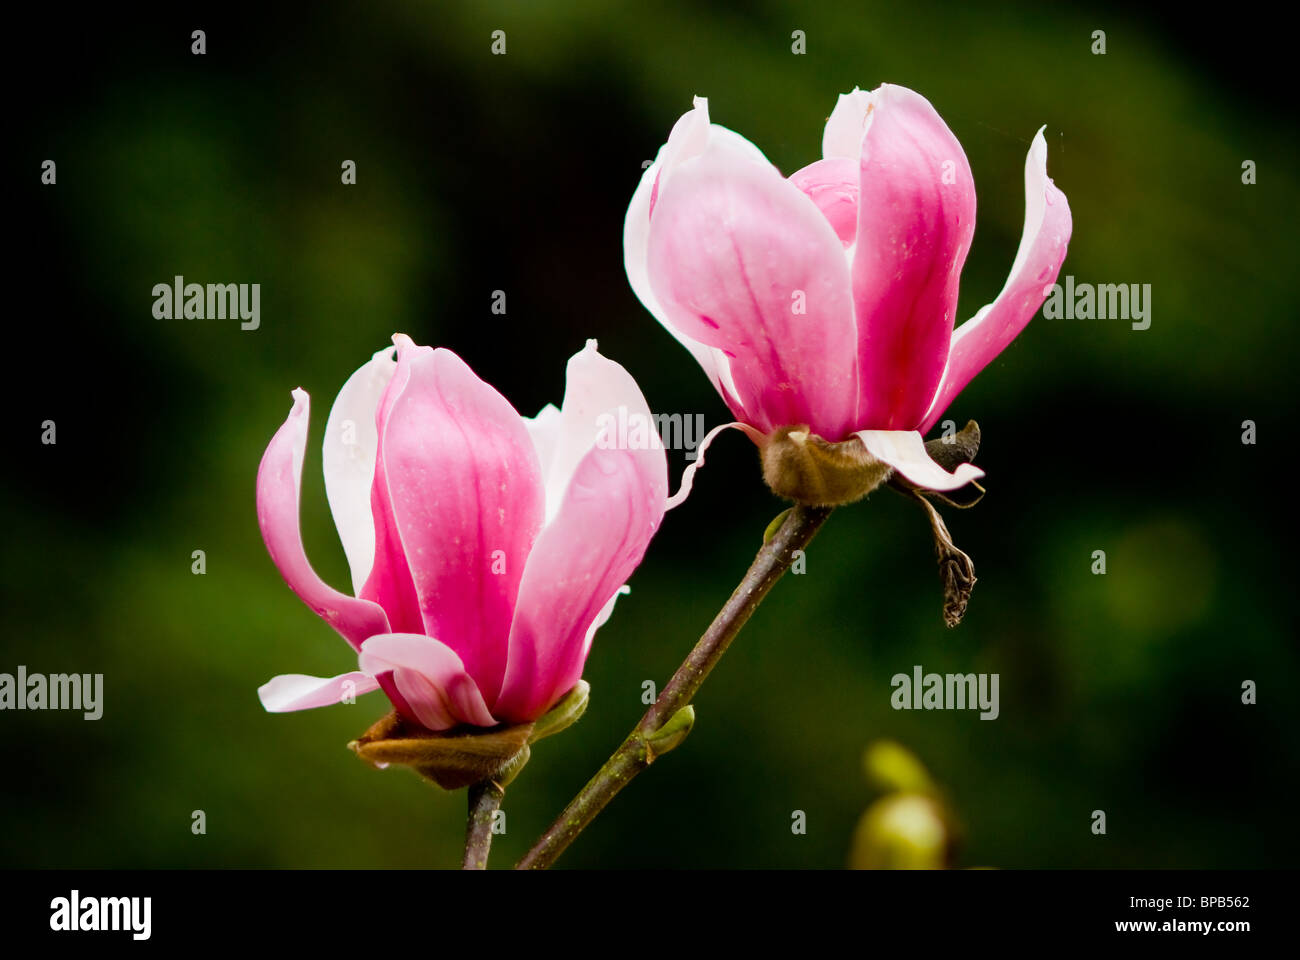 Big pink flowers stock photos big pink flowers stock images alamy two big pink flowers blossom stock image mightylinksfo